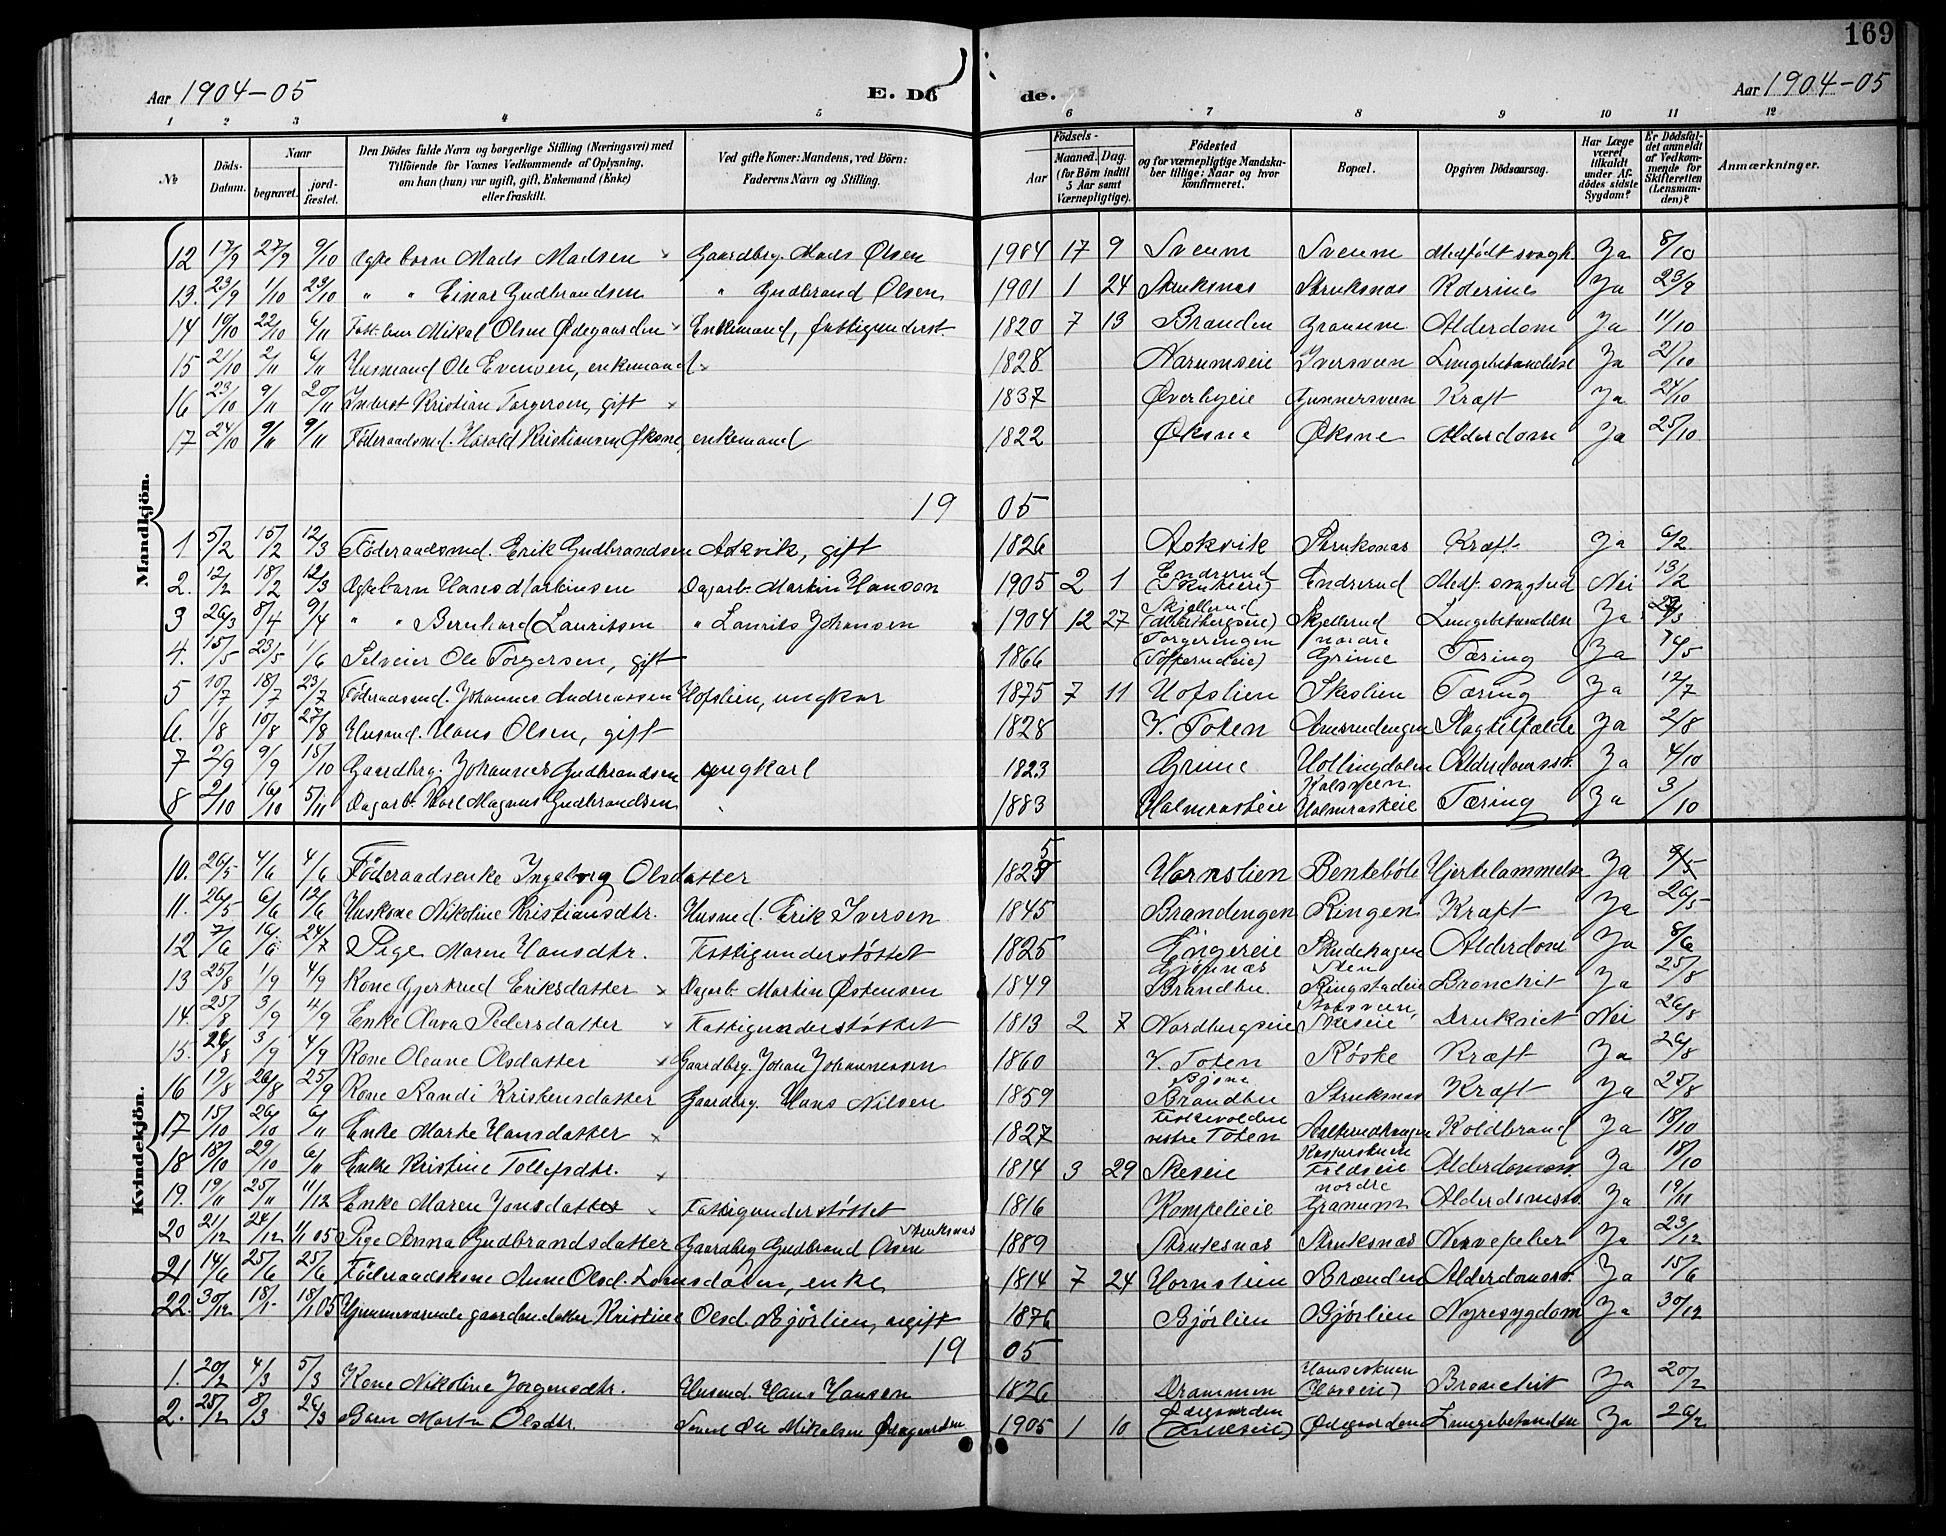 SAH, Søndre Land prestekontor, L/L0004: Klokkerbok nr. 4, 1901-1915, s. 169